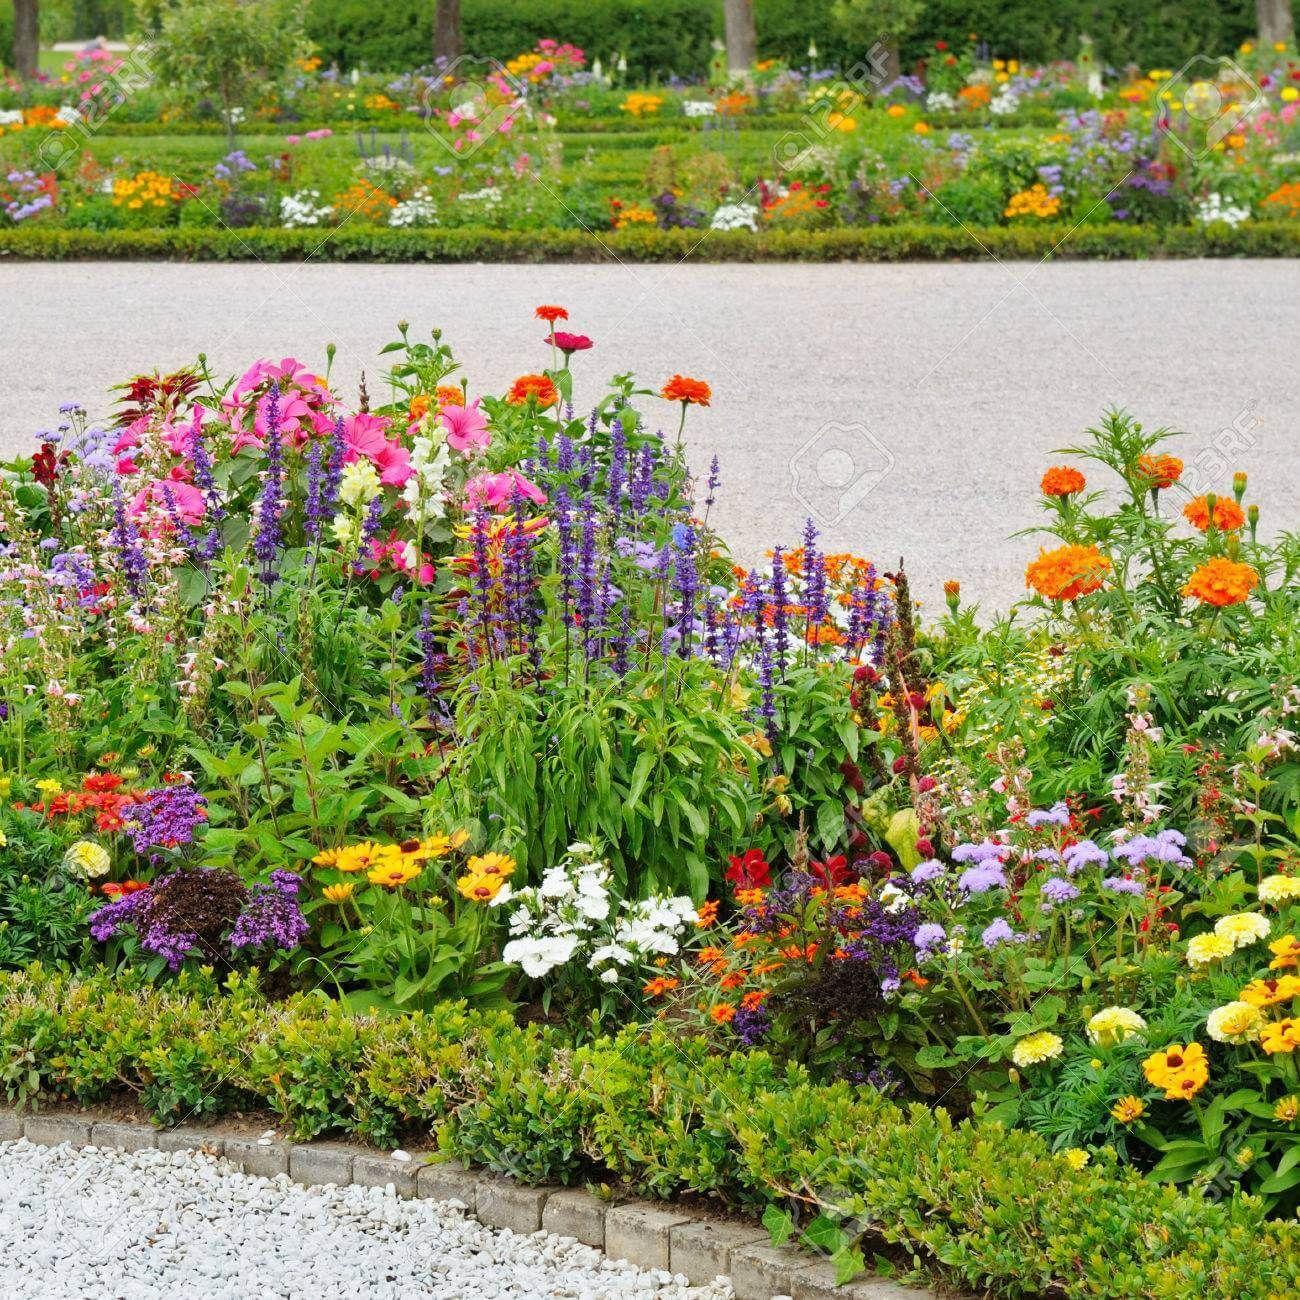 27 Flower Garden Designs For A Small Space Flower Garden Design